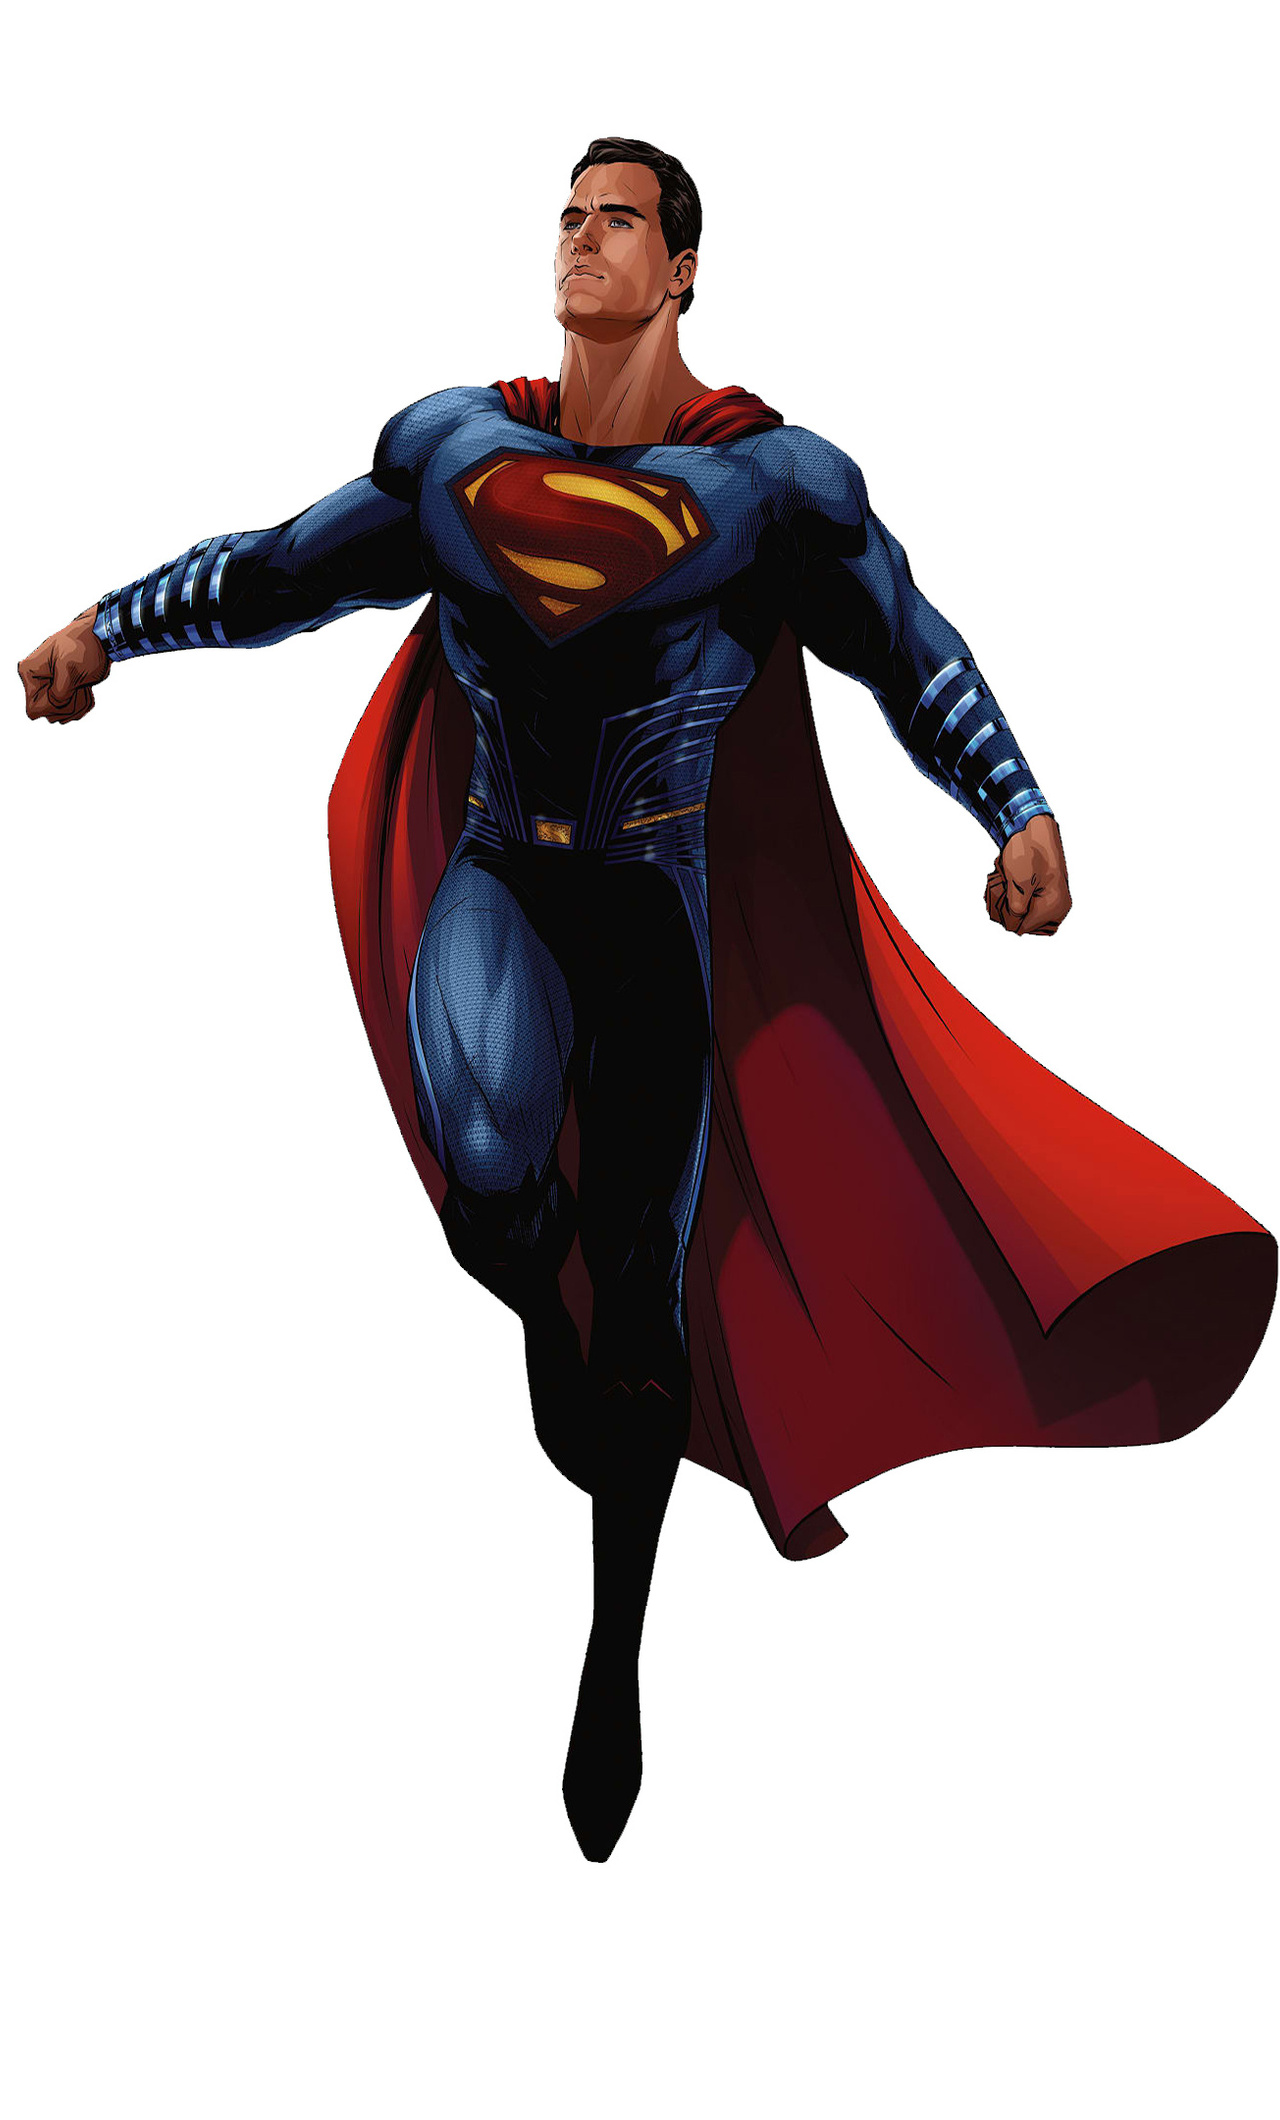 1280x2120 Superman Dc Comic Artwork iPhone 6+ HD 4k ...